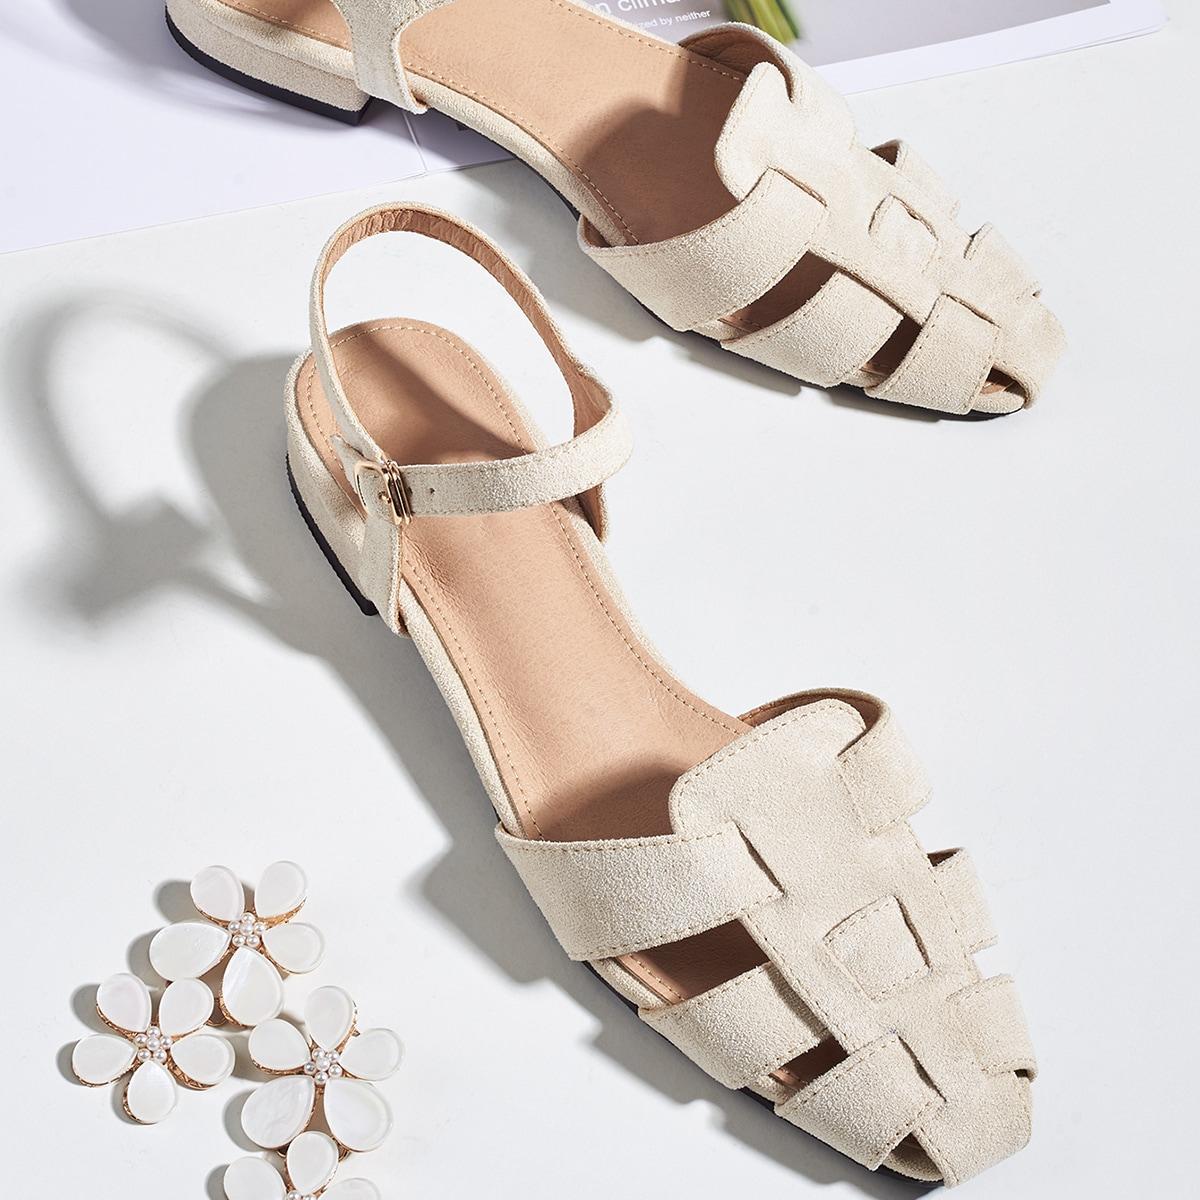 Замшевые туфли на плоской подошве от SHEIN